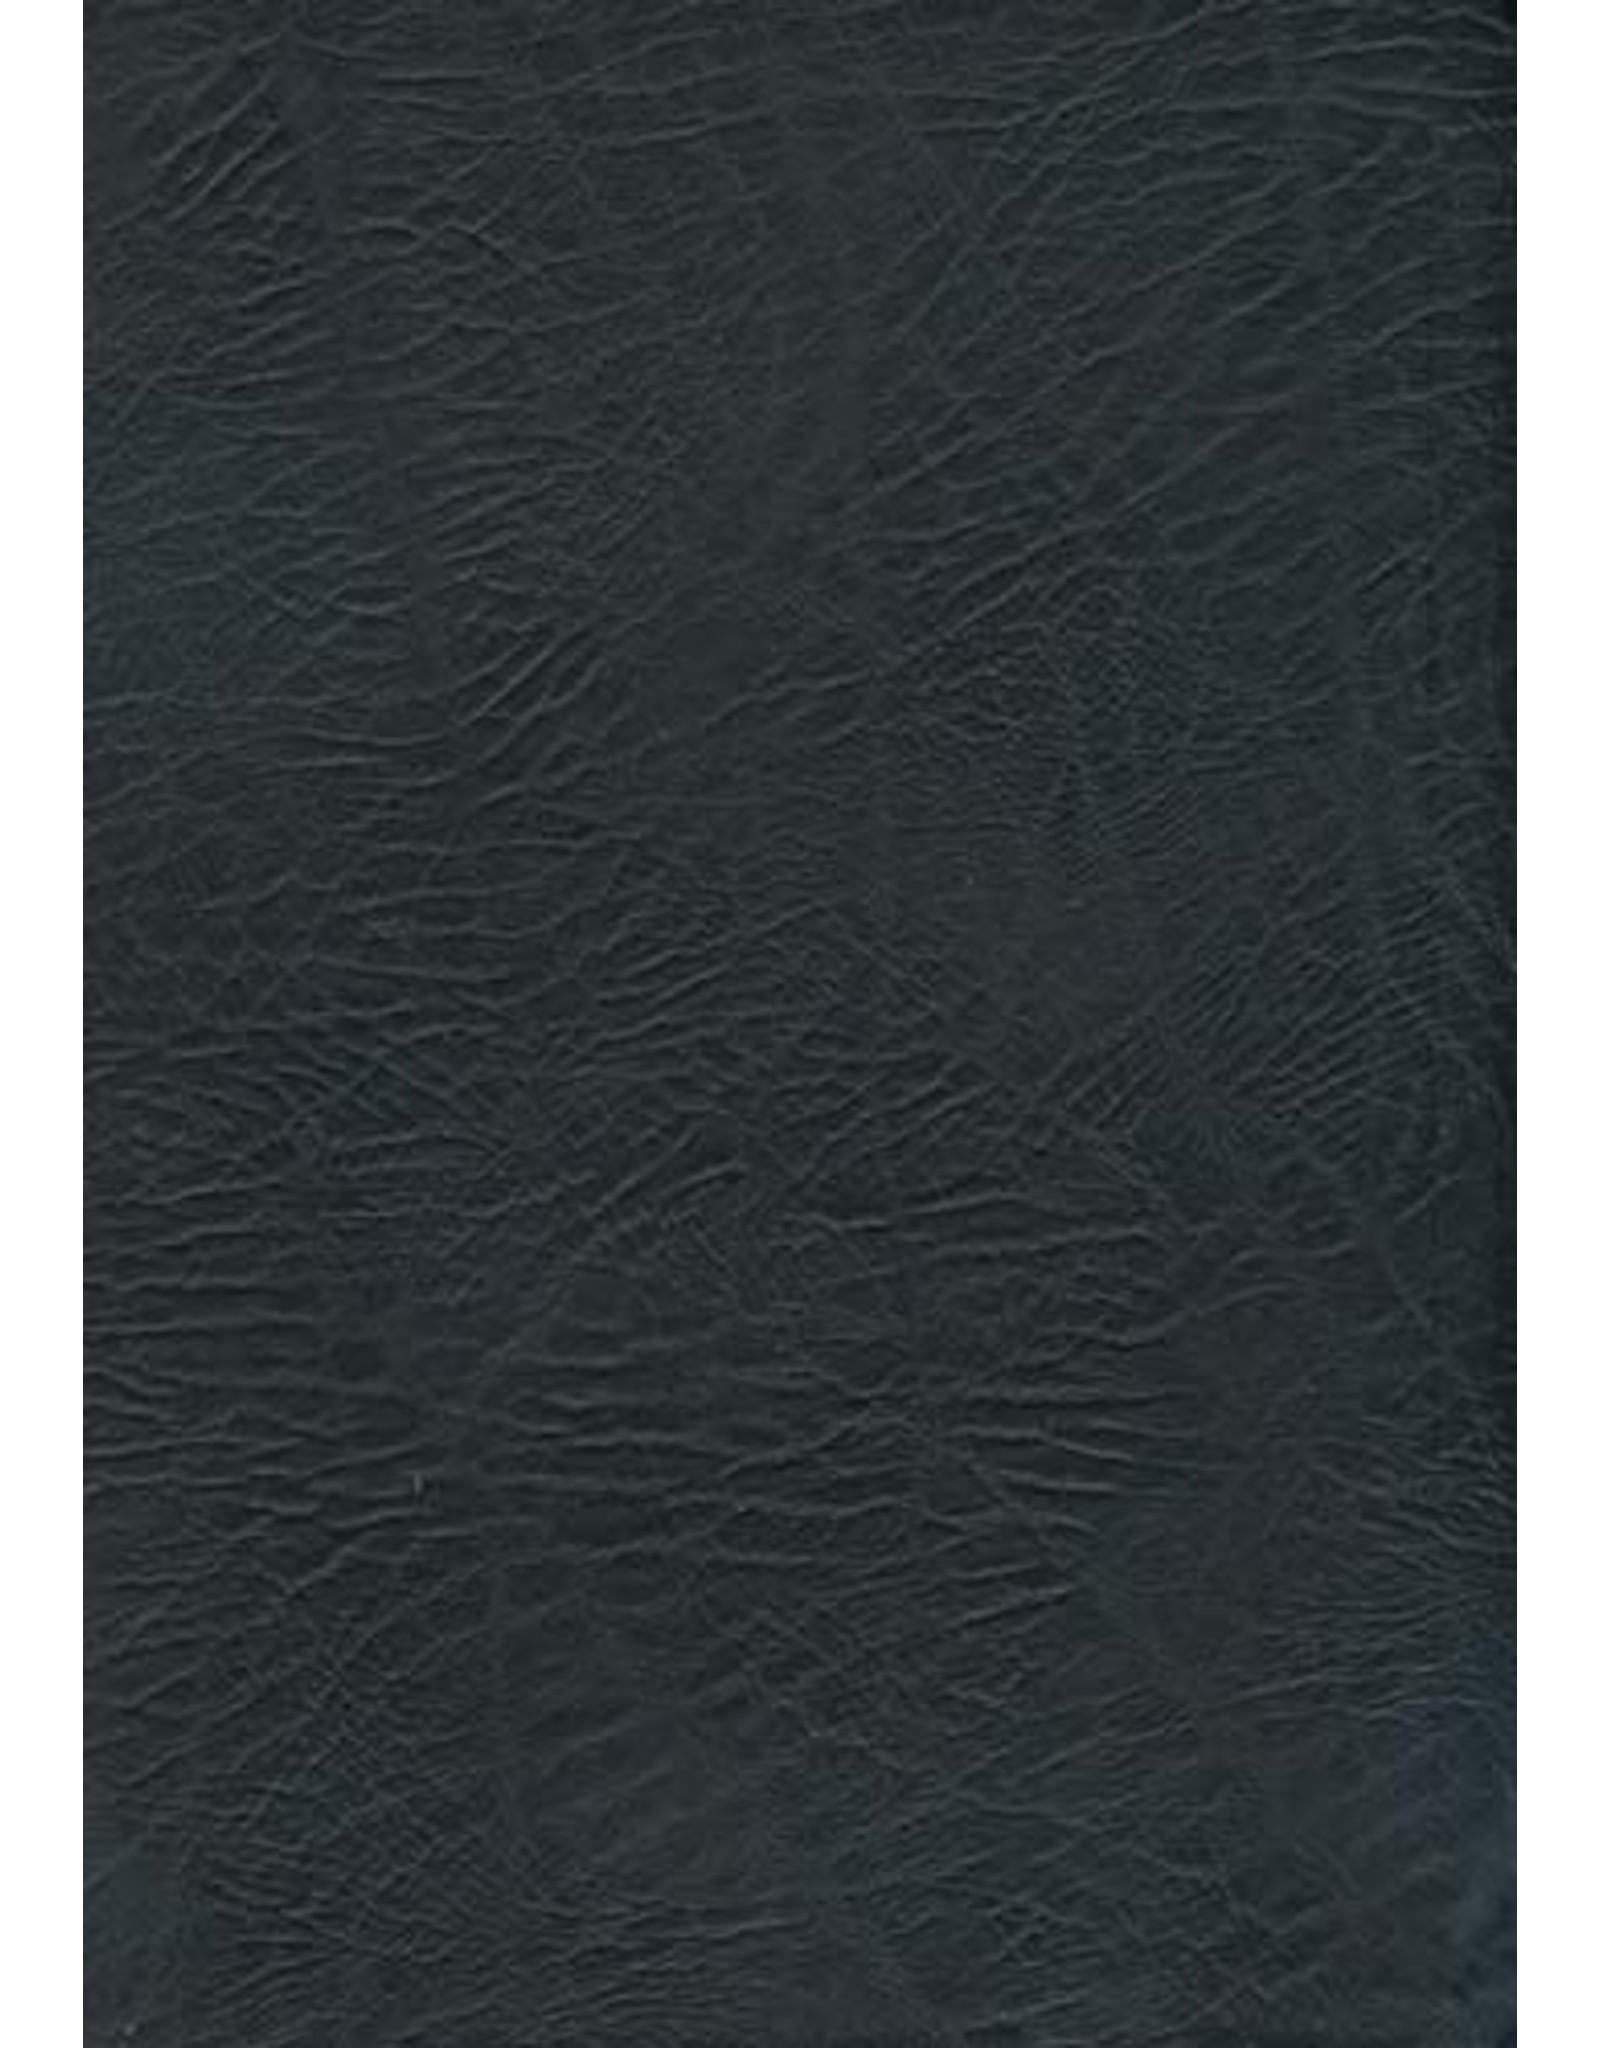 Harper Collins / Thomas Nelson / Zondervan MacArthur Study Bible: NASB Large Print, Bonded Indexed